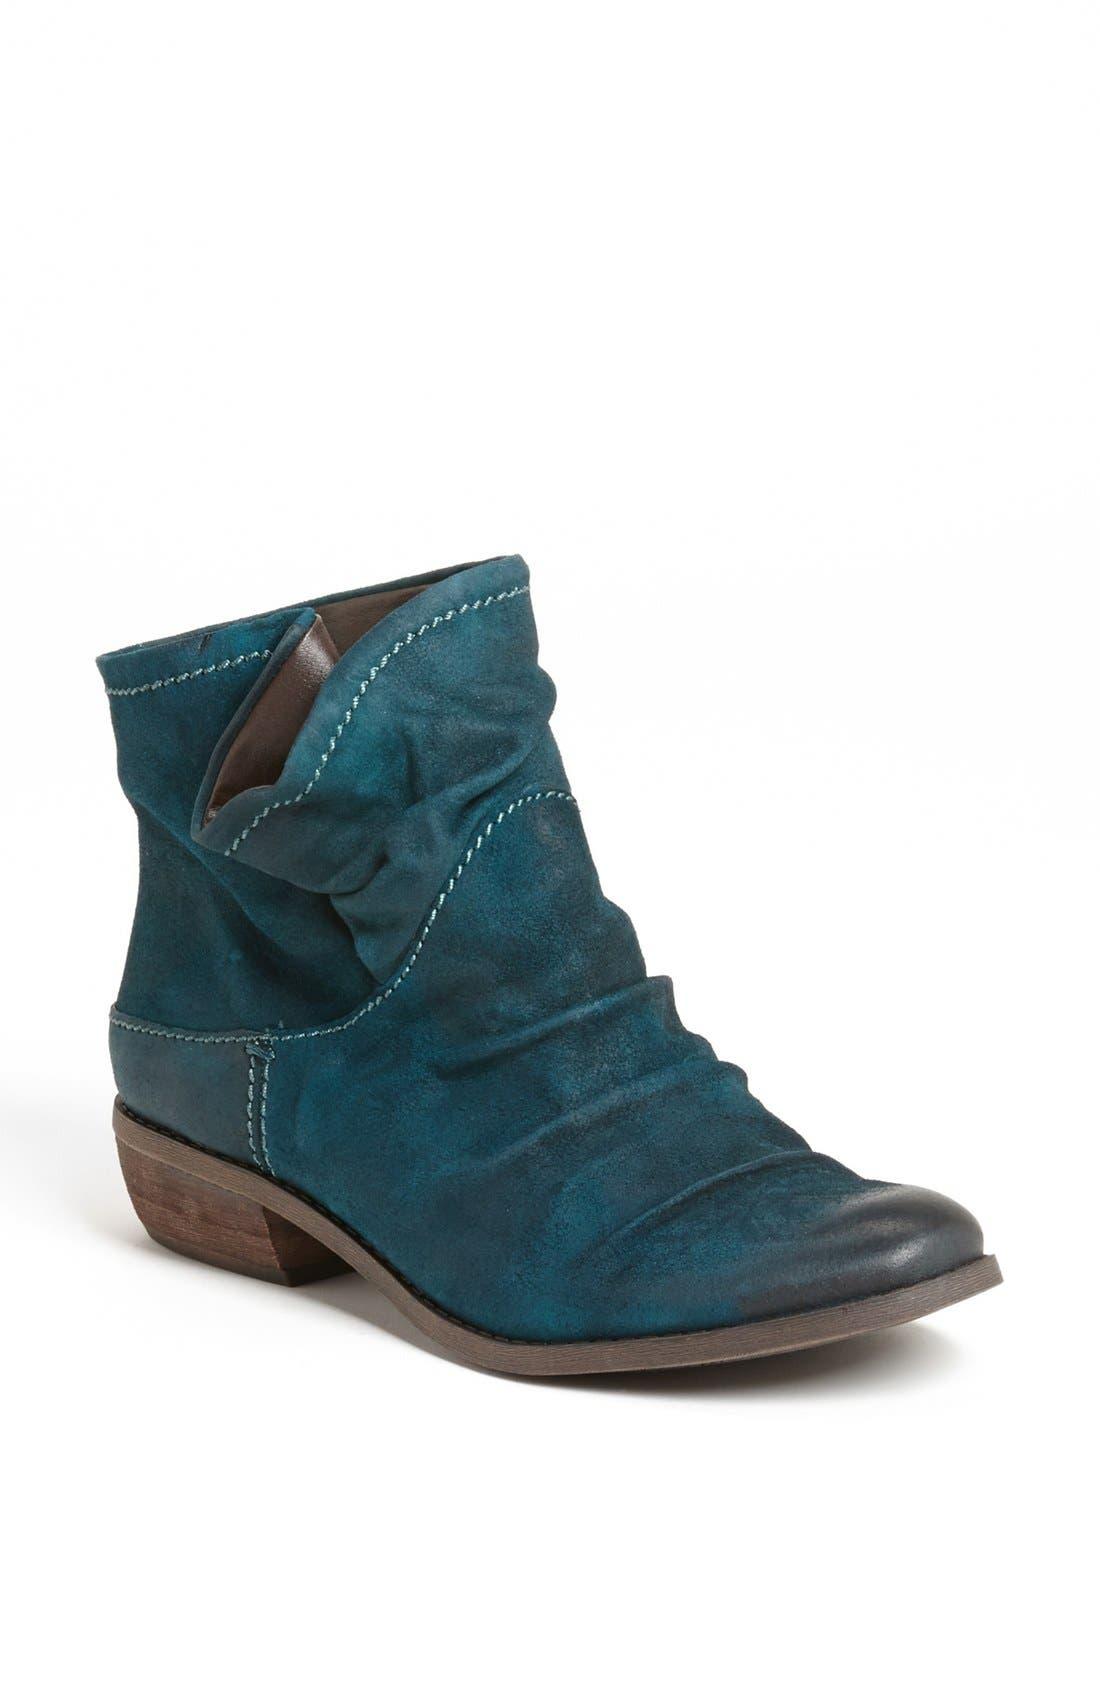 Alternate Image 1 Selected - Fergie 'Monet' Boot